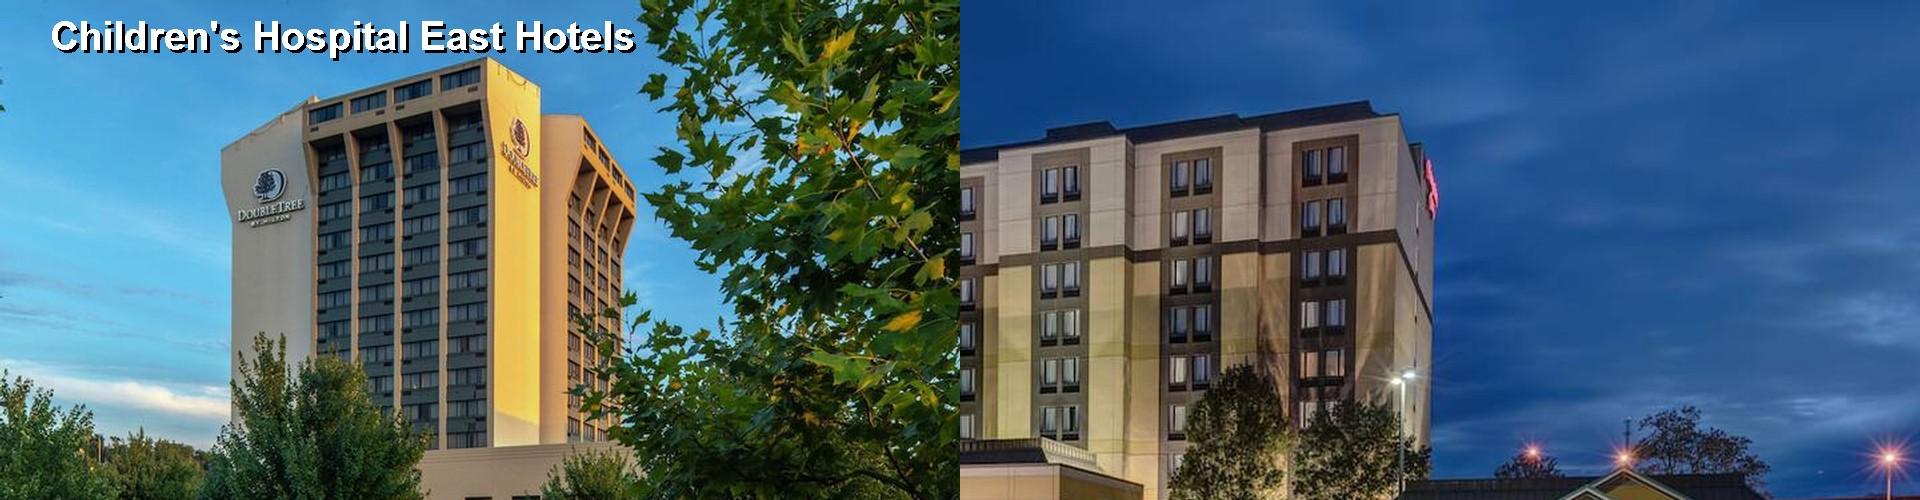 41 Hotels Near Children S Hospital East In Monroeville Pa